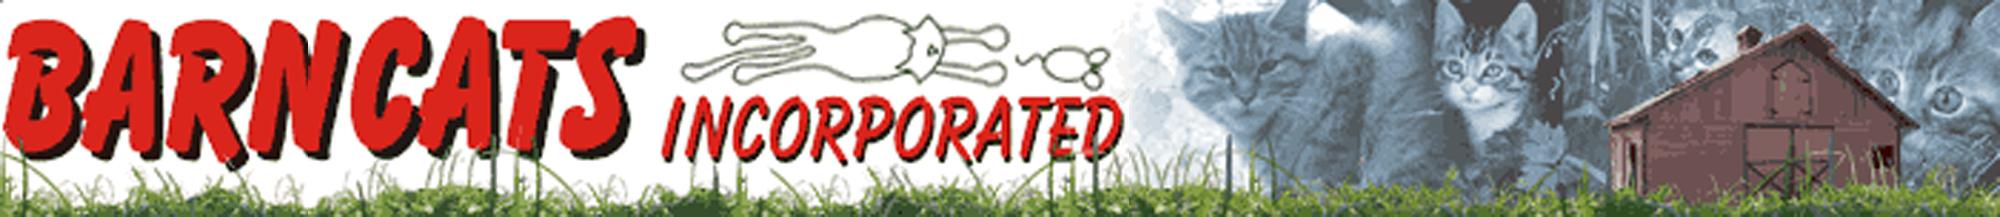 BARNCATS Incorporated